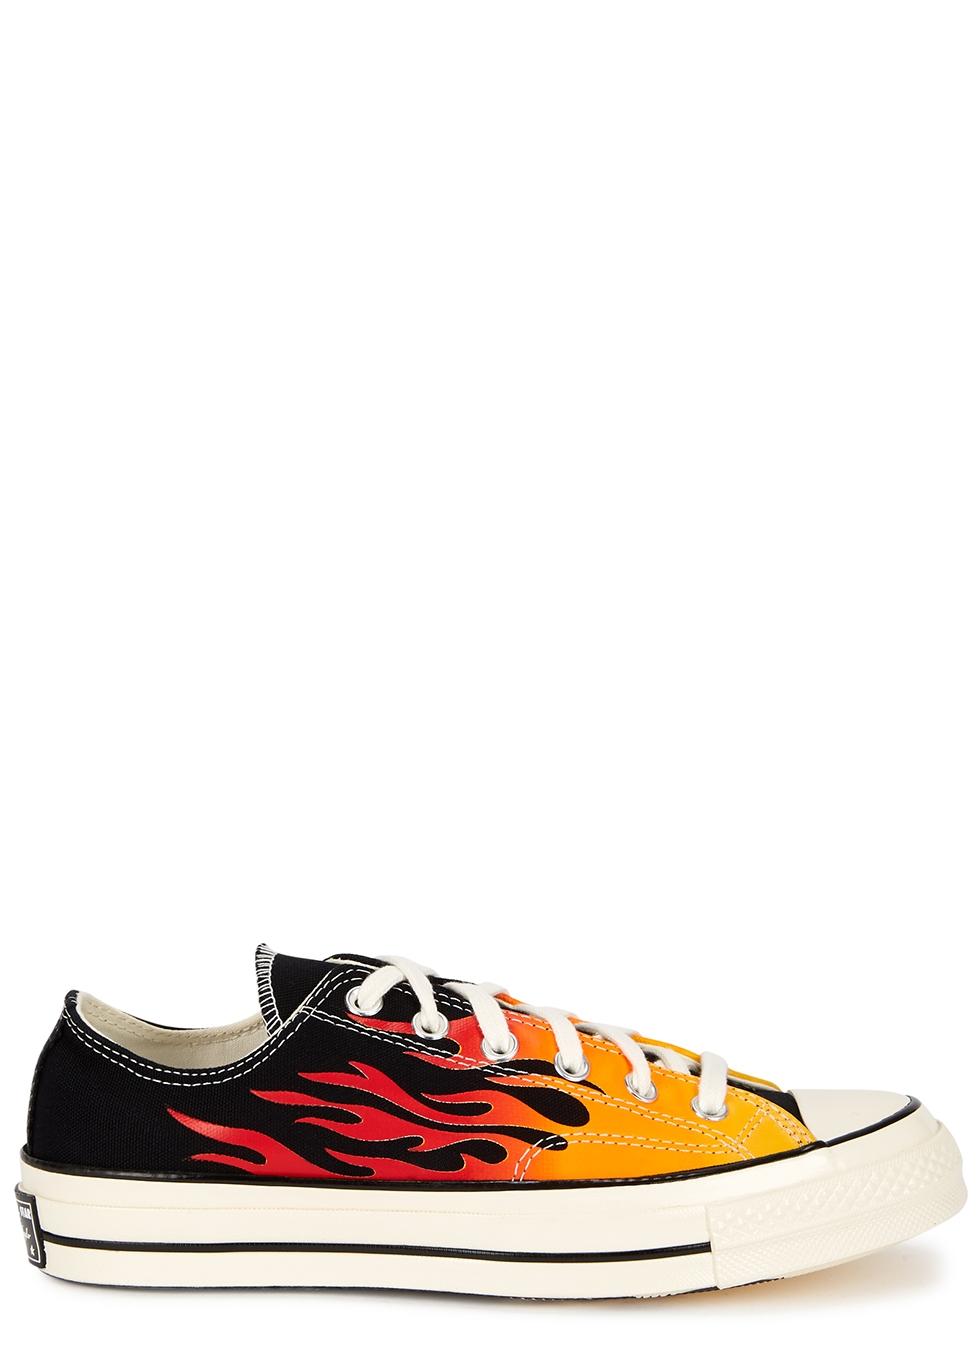 Converse Chuck 70 flame-print canvas